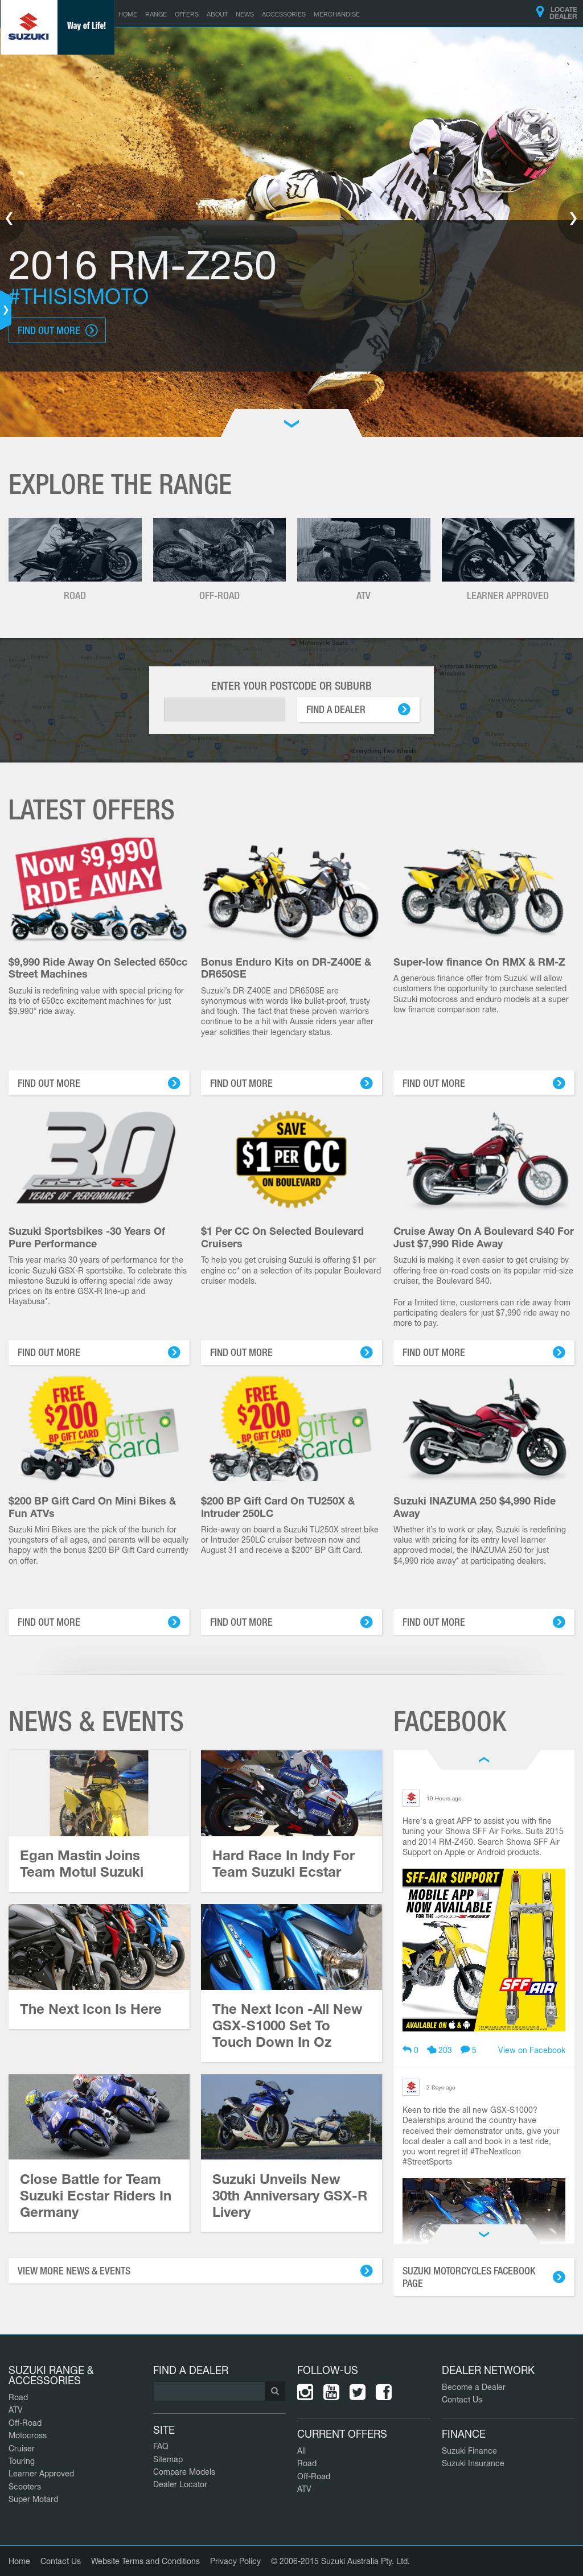 Suzuki Australia Pty Competitors, Revenue and Employees - Owler